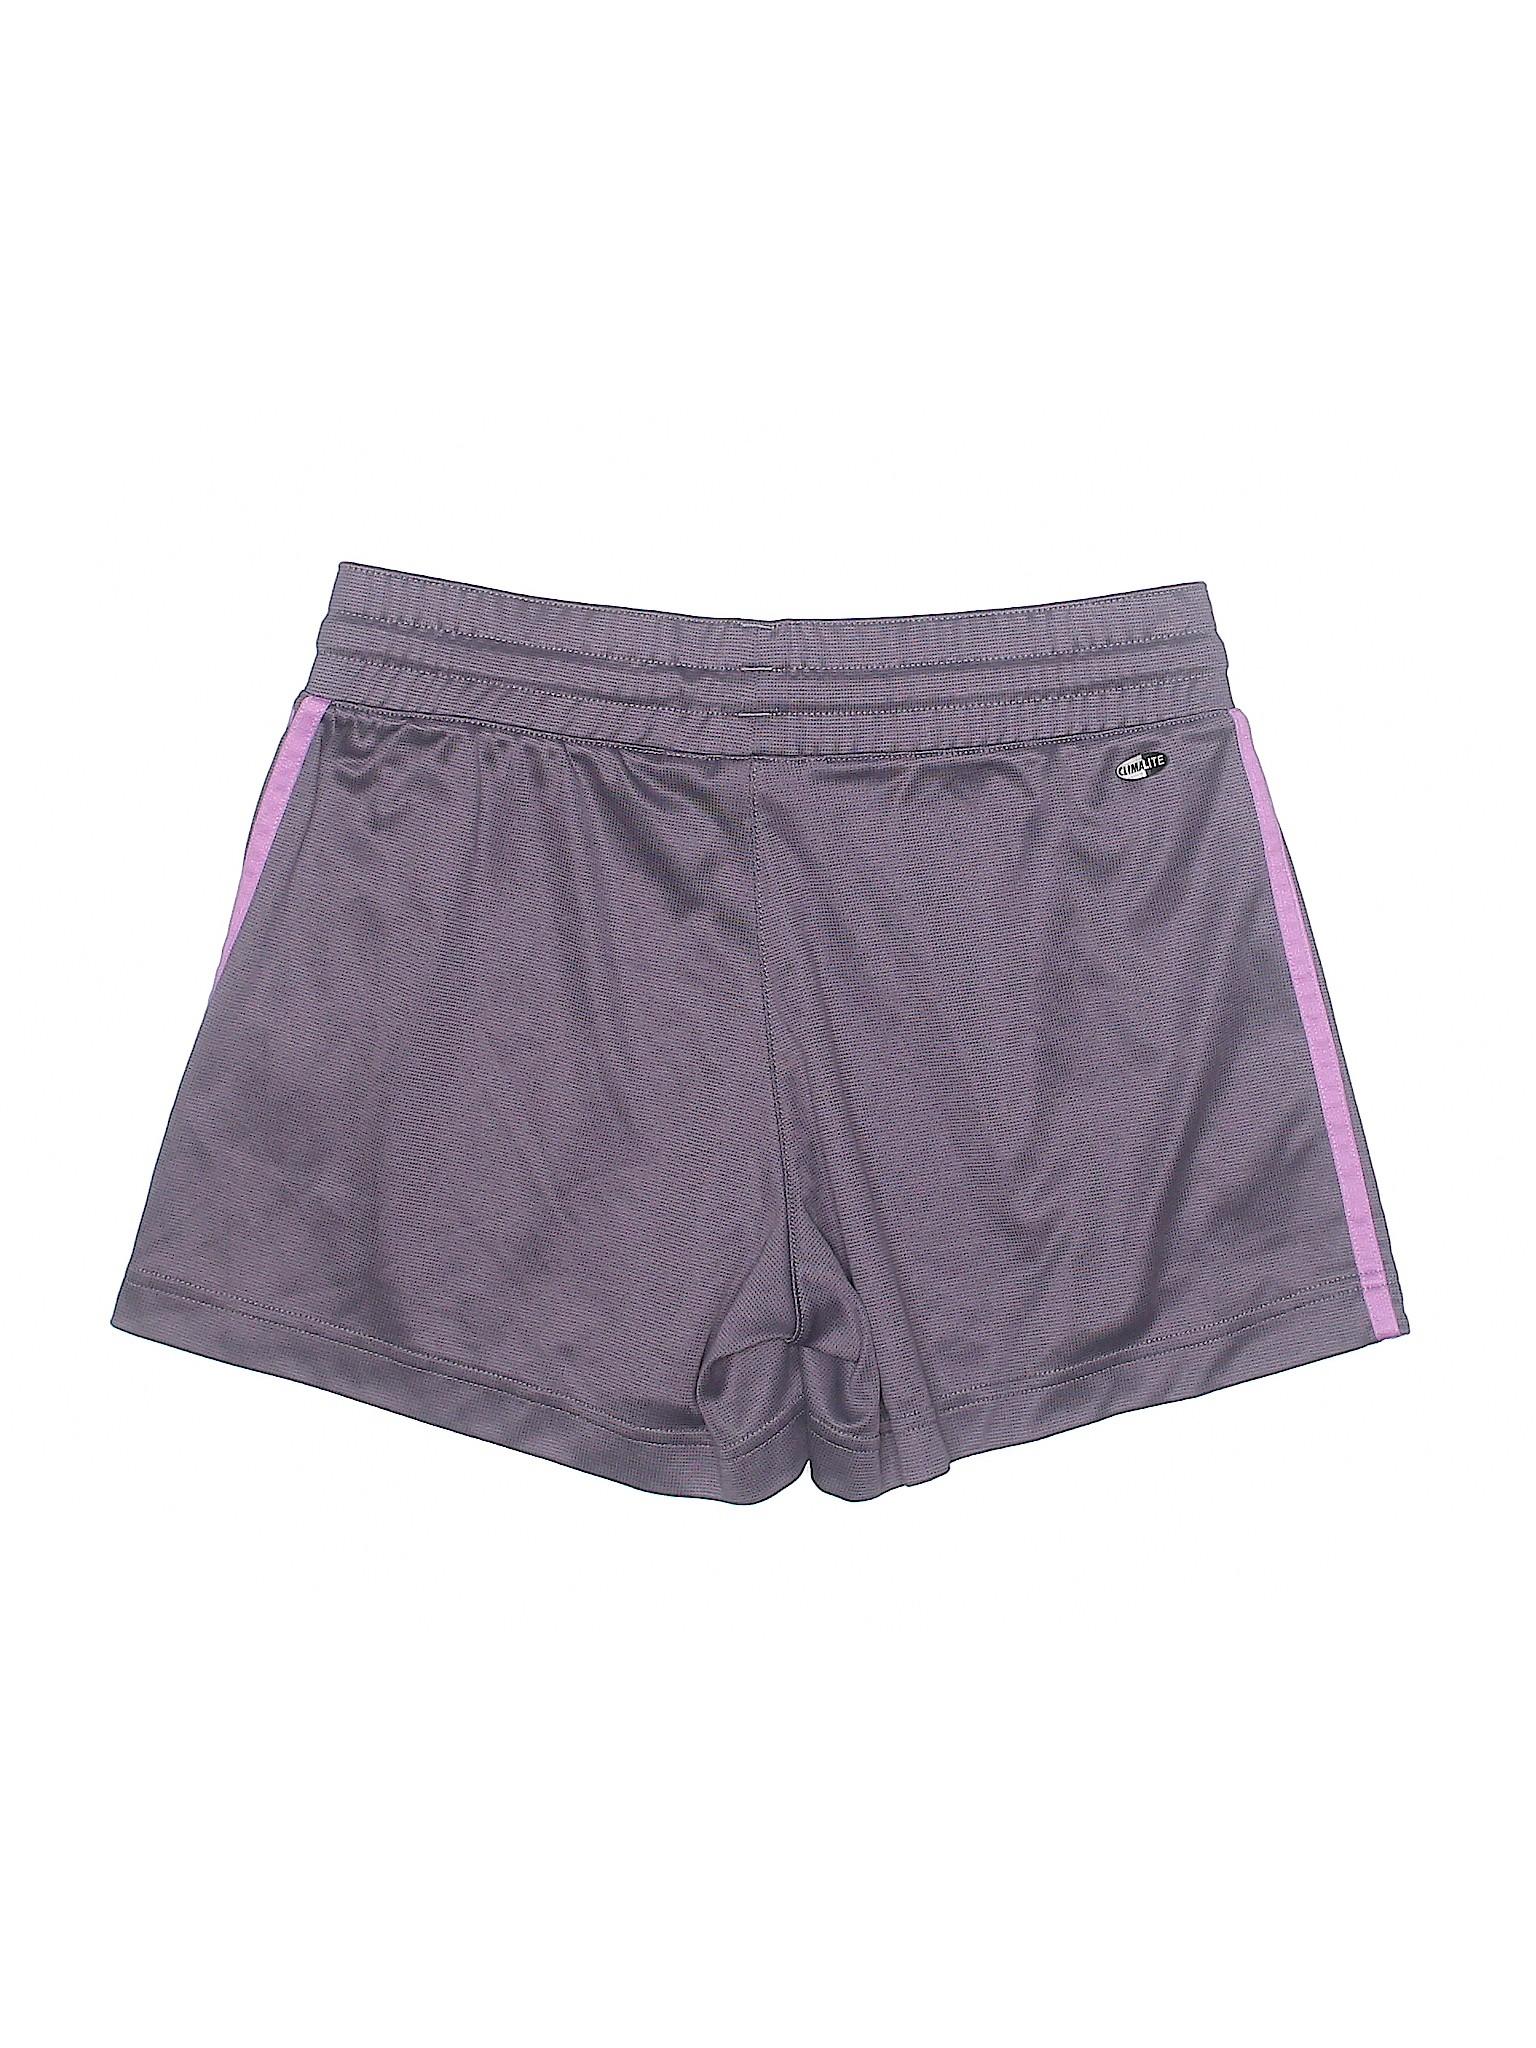 Adidas Boutique Adidas Athletic Boutique Shorts Athletic Adidas Boutique Shorts Athletic Shorts EfWqT8X8n